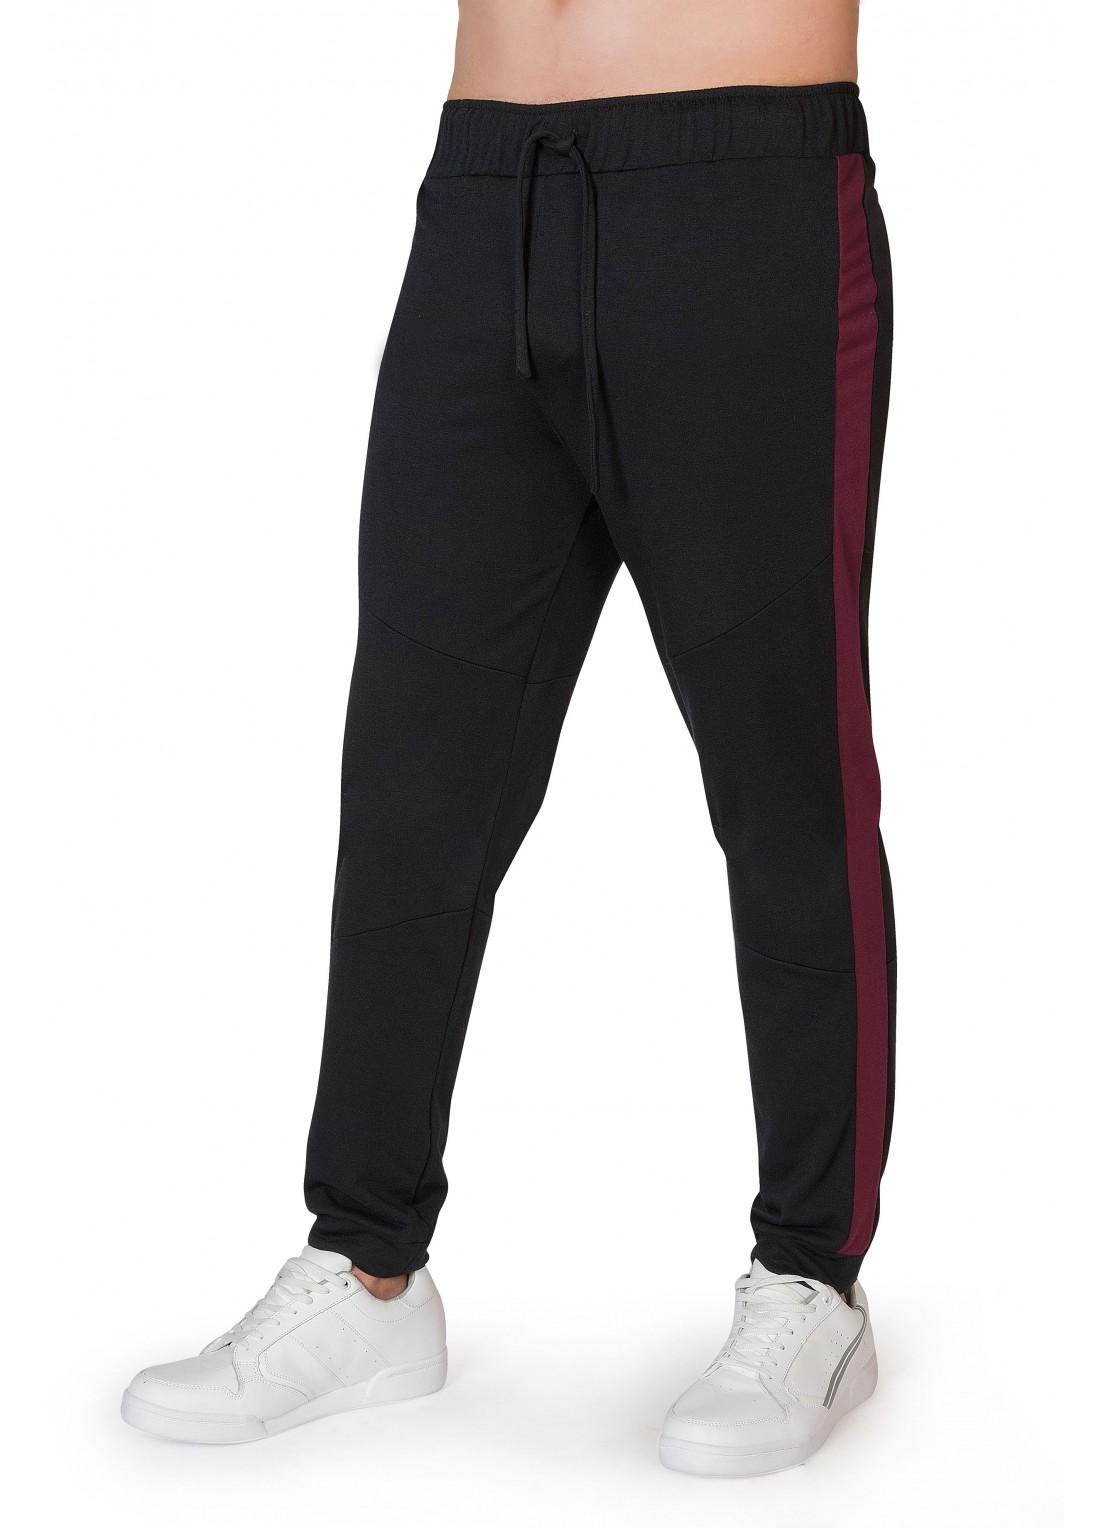 Pants coordinado